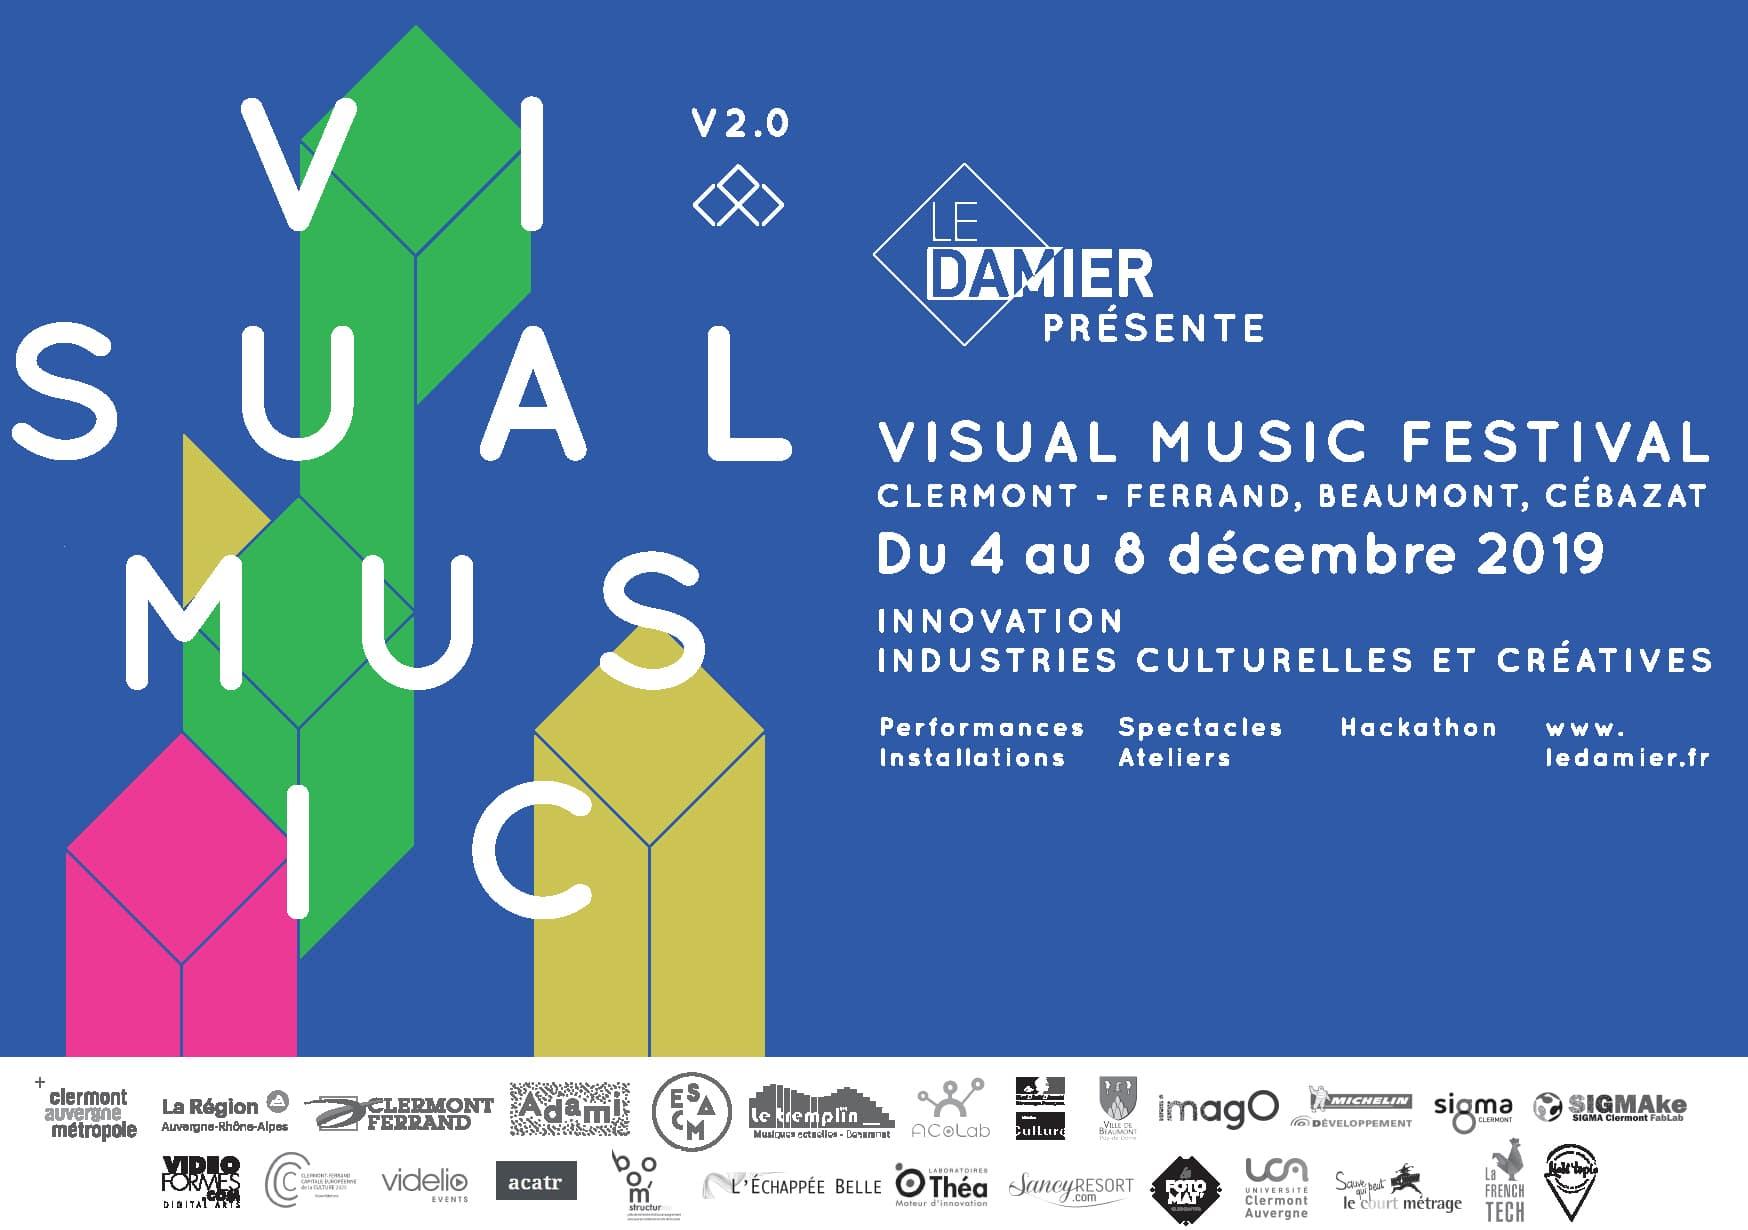 Visual music festival